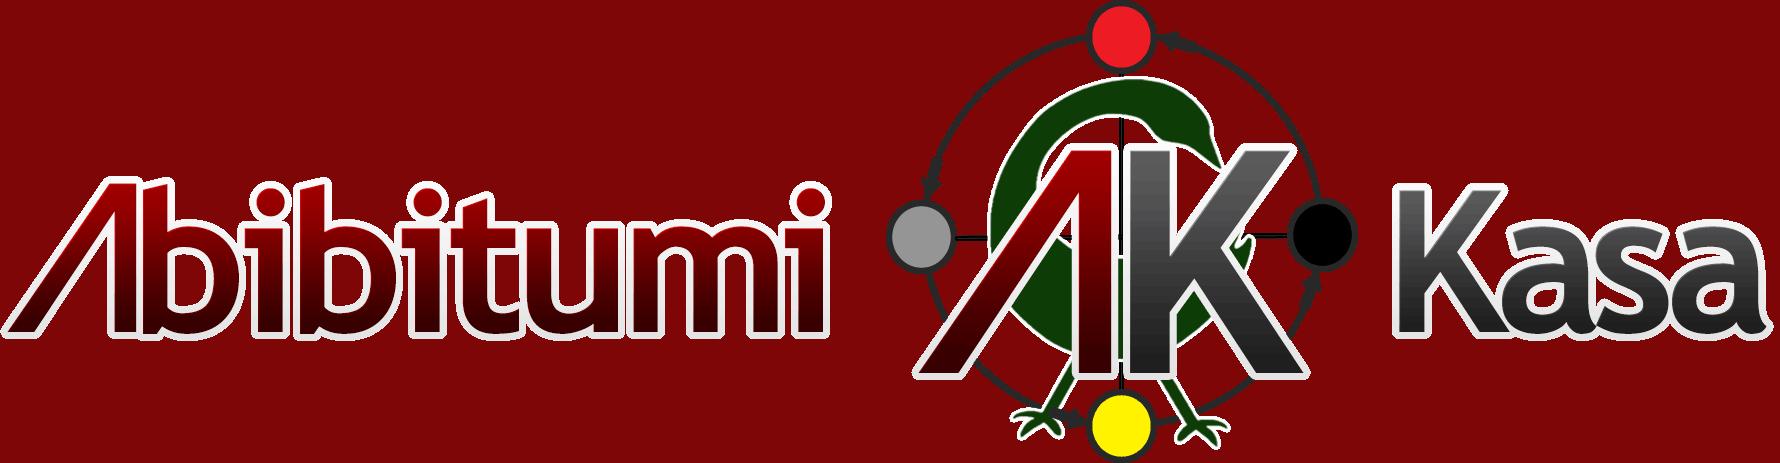 Abibitumi Kasa Logo